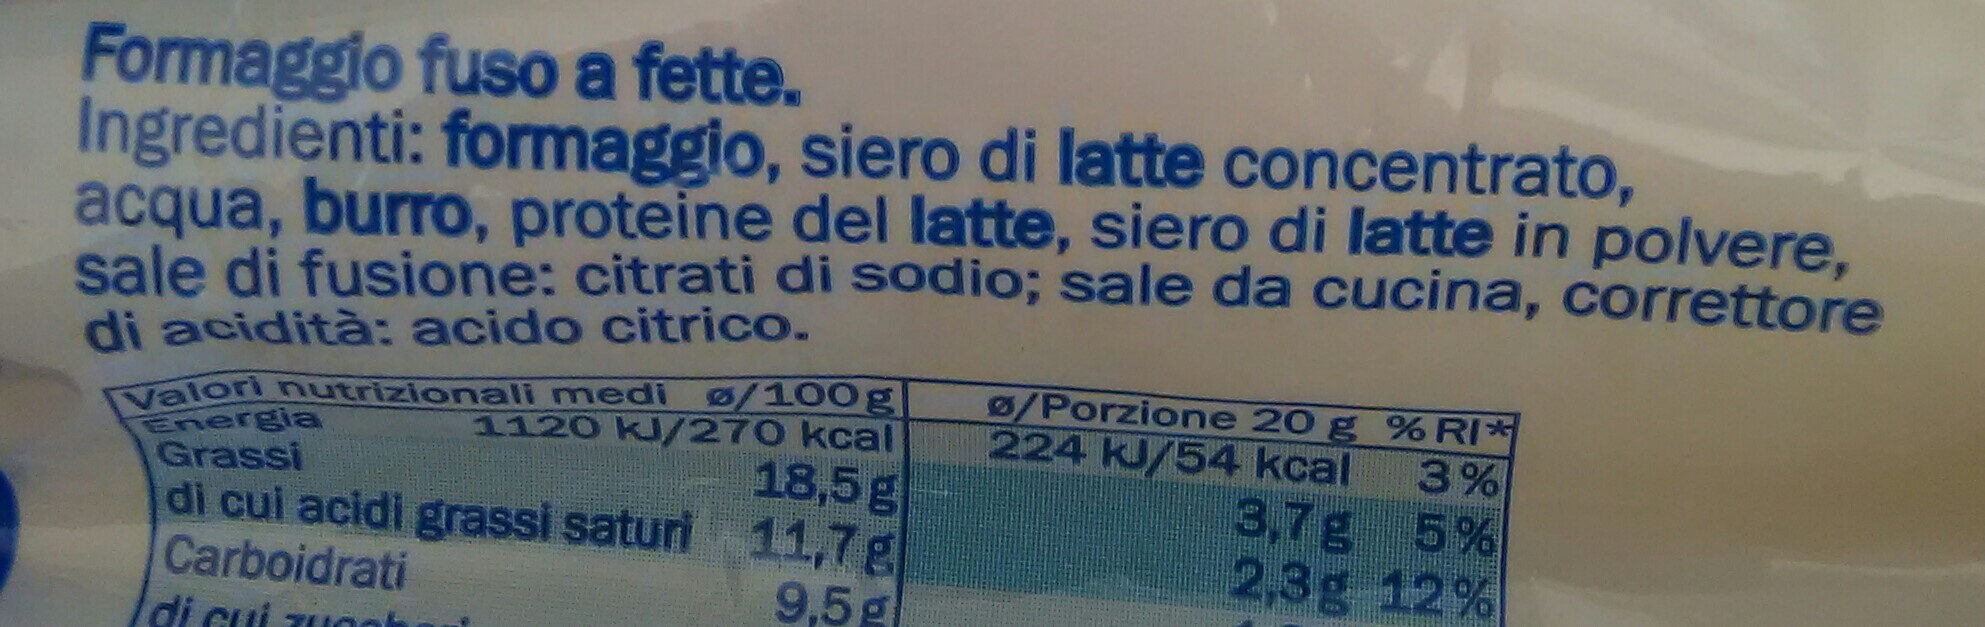 fettine di formaggio fuso - Ingredients - it